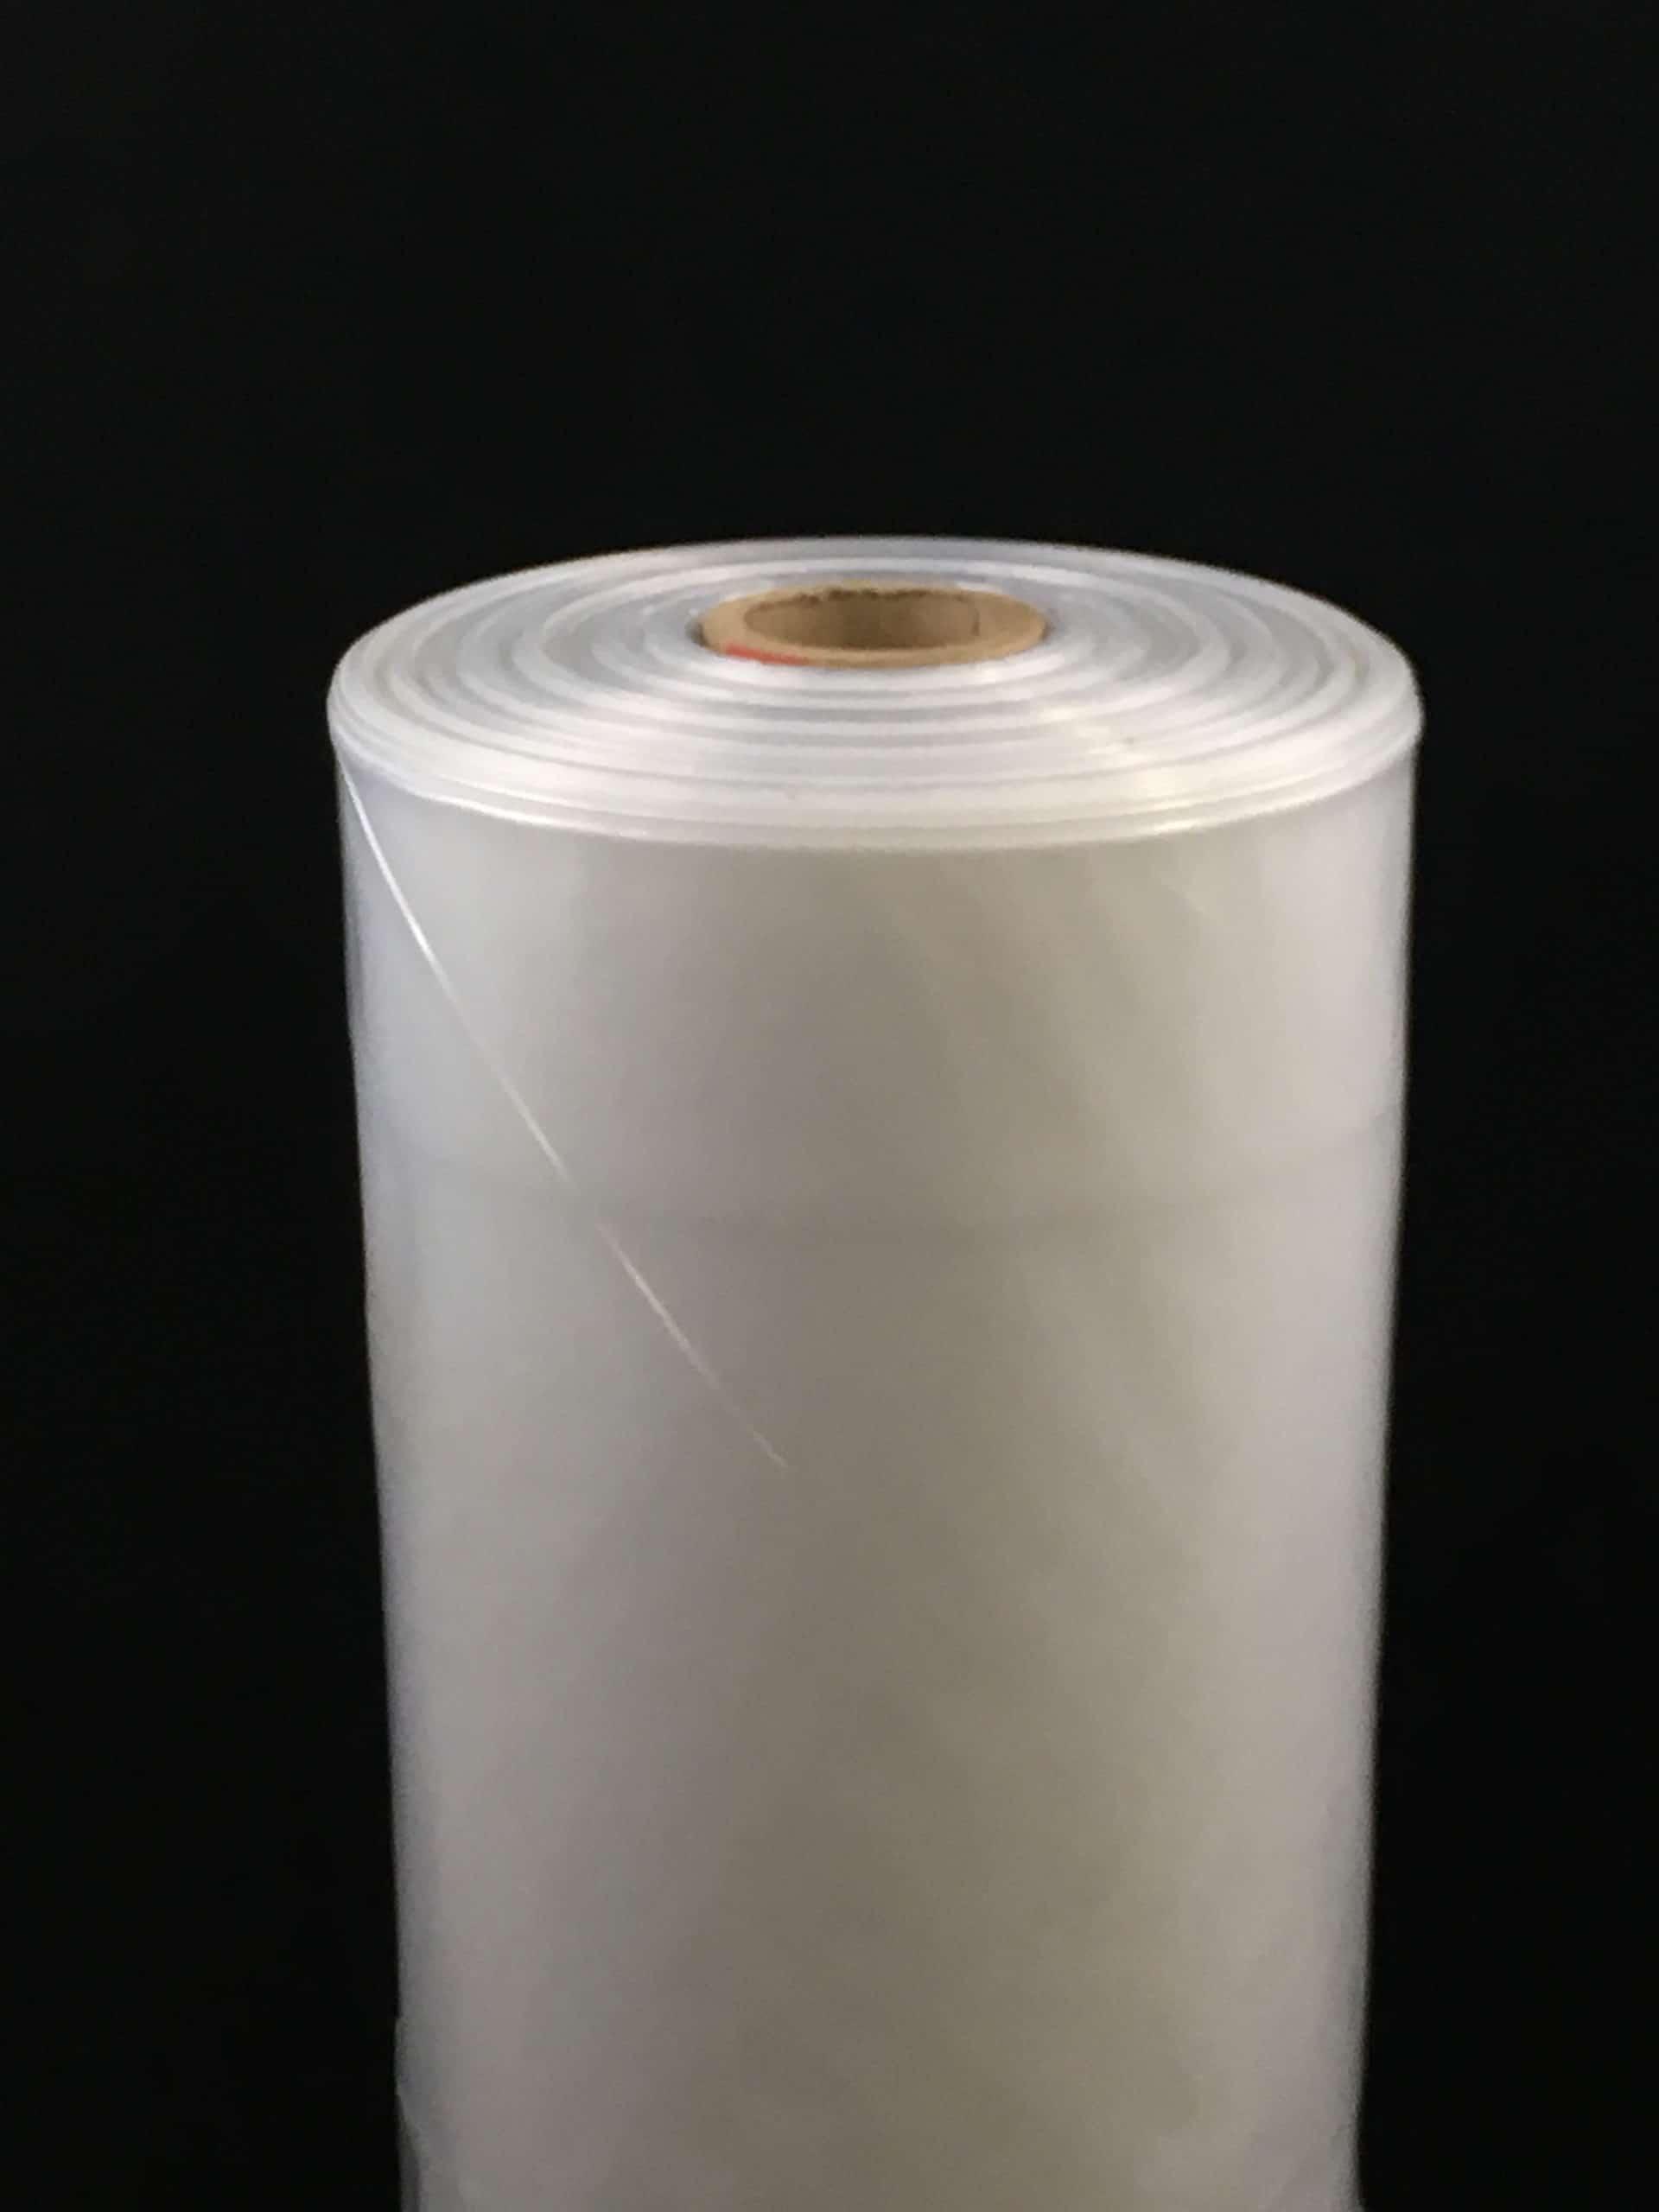 Pallet Stretch Wrap Cling Film